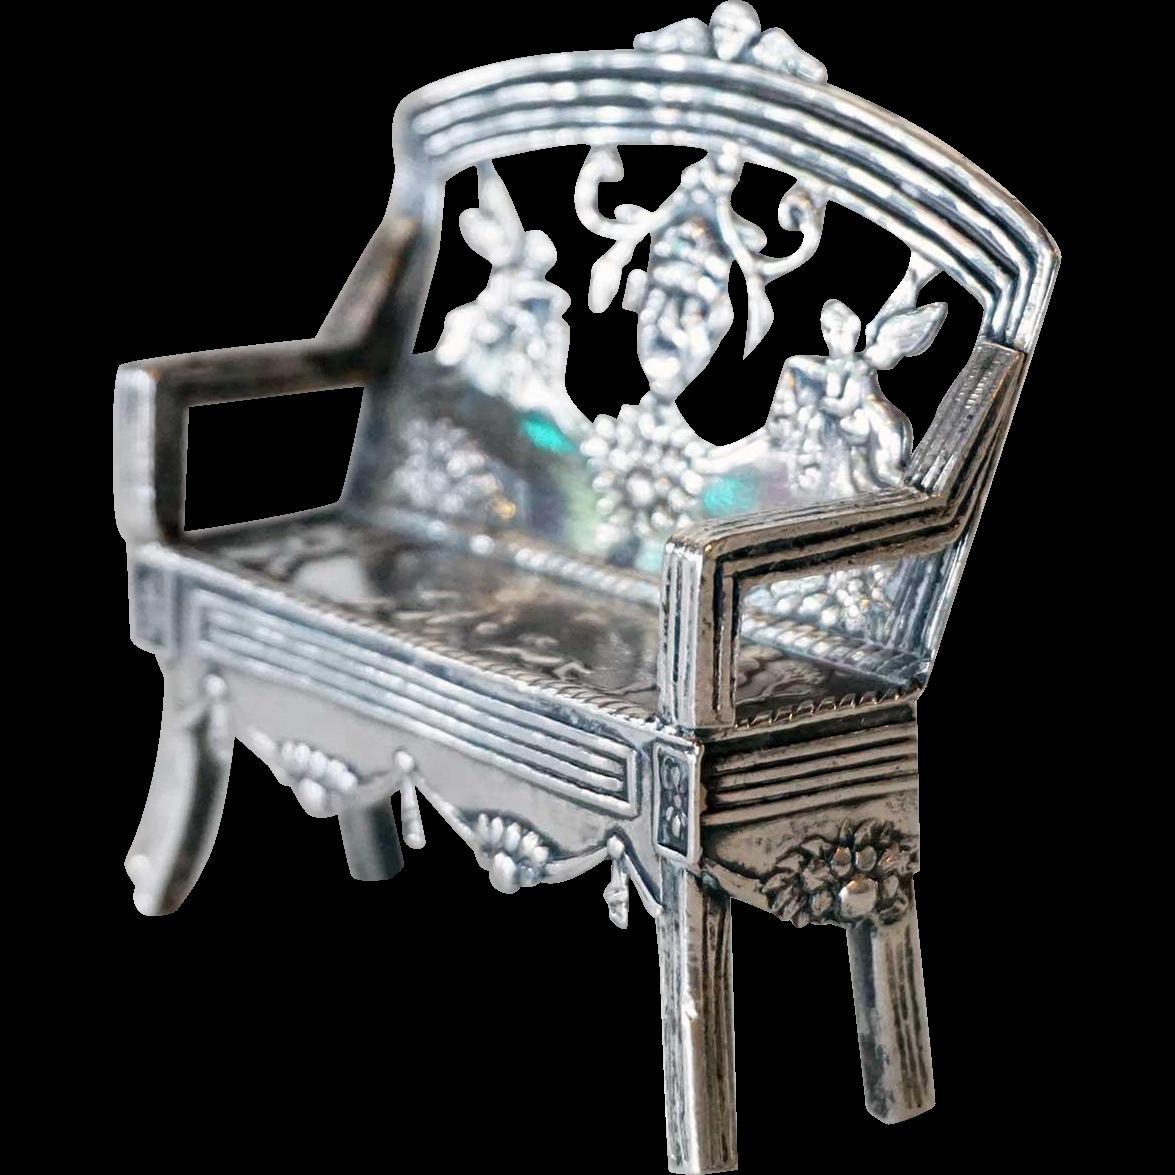 Dutch Silver Miniature Model of a Settee